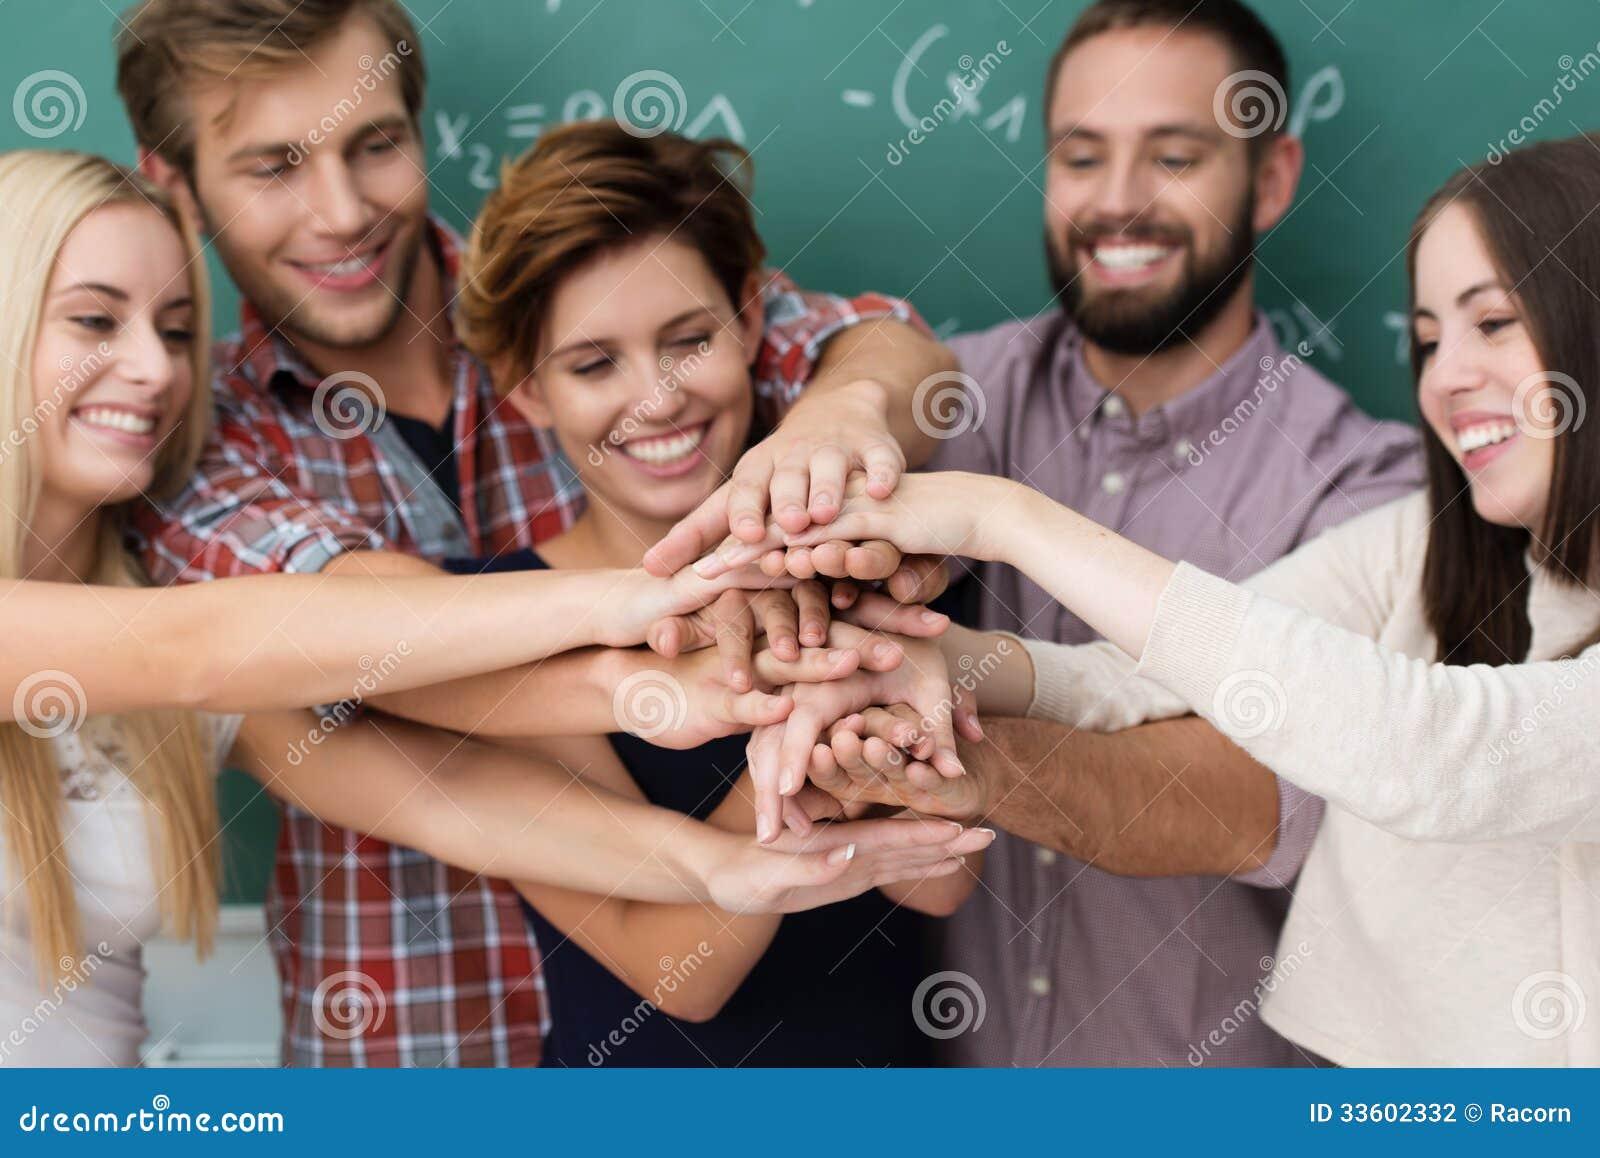 Teamwork and collaboration amongst students